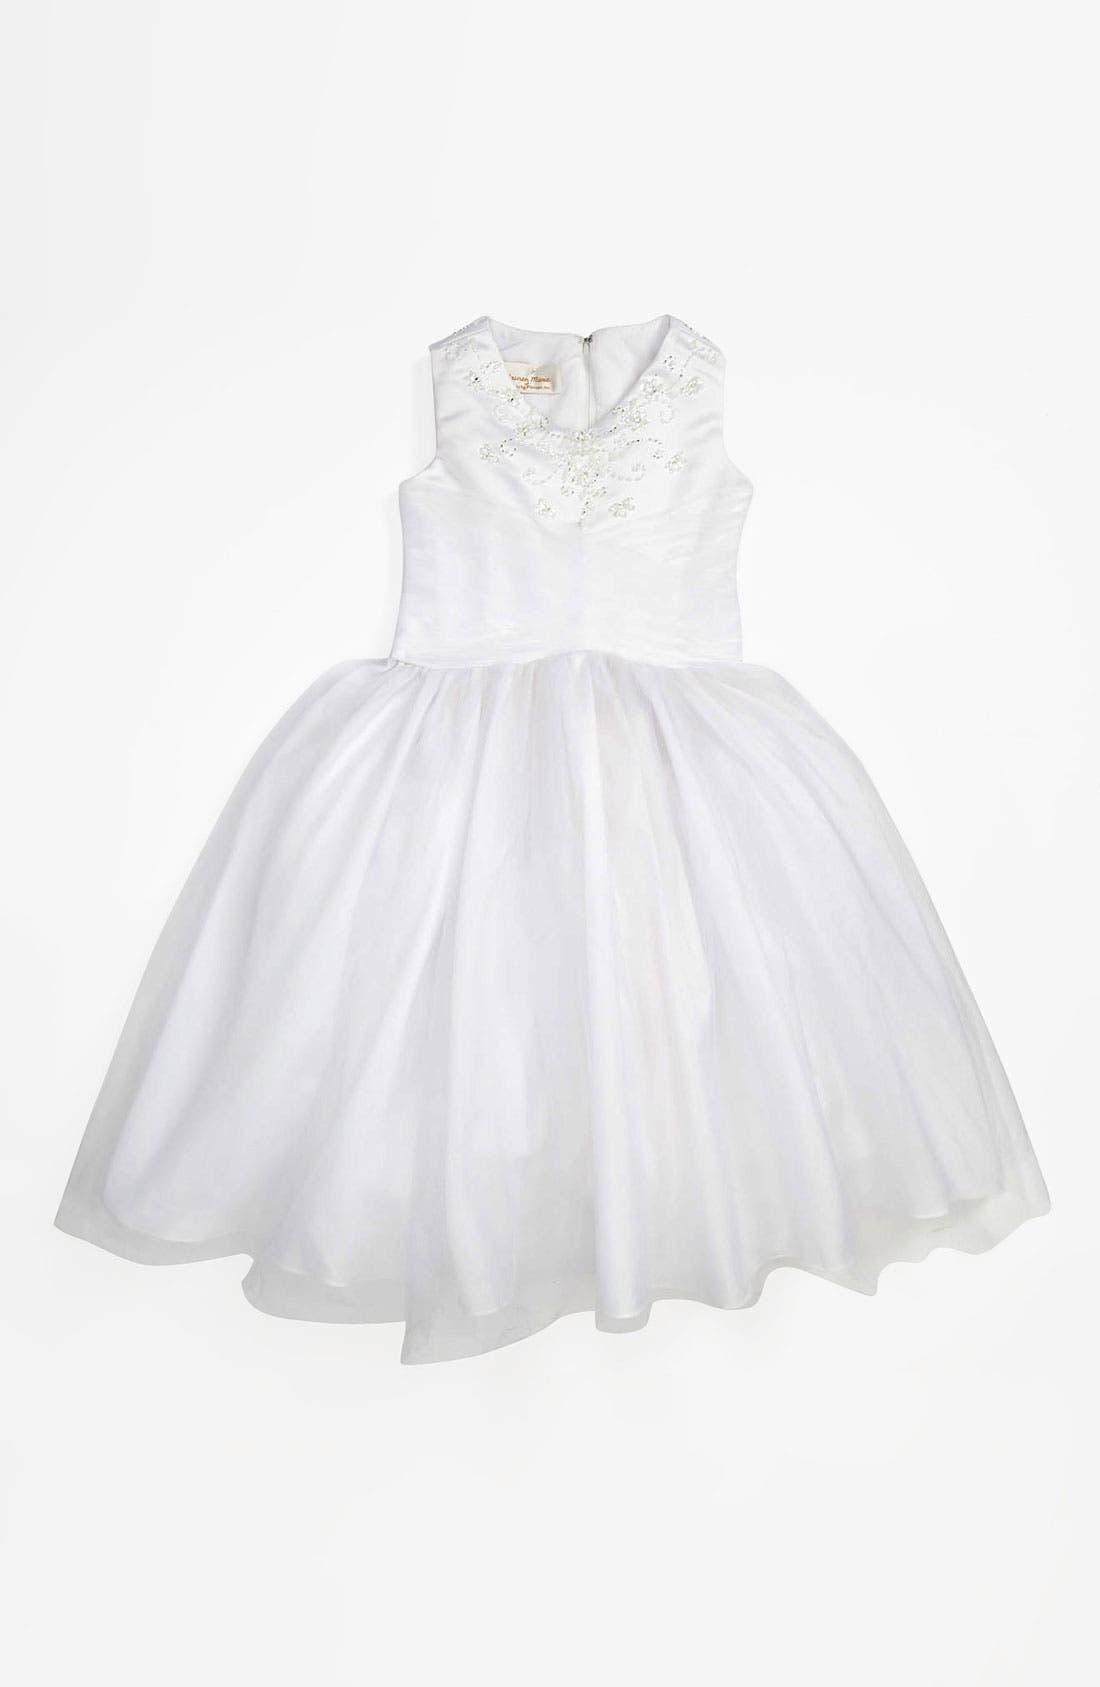 Main Image - Lauren Marie Tulle Dress (Little Girls & Big Girls)